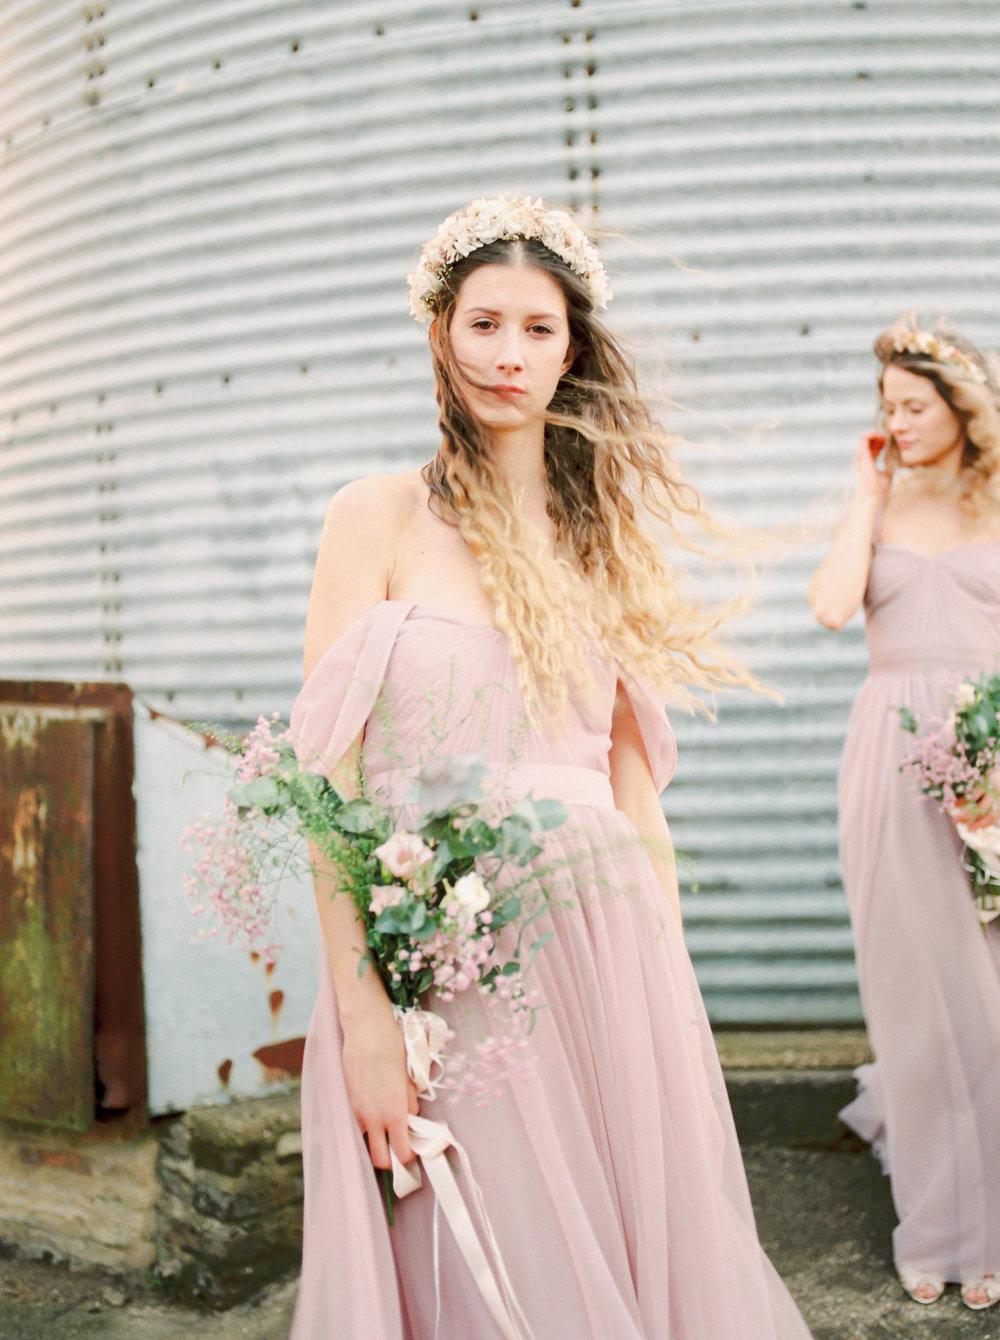 Amy O'Boyle Photography- Destination & UK Fine Art Film Wedding Photographer- TH&TH Bridesmaid Dress Shoot-20.jpg